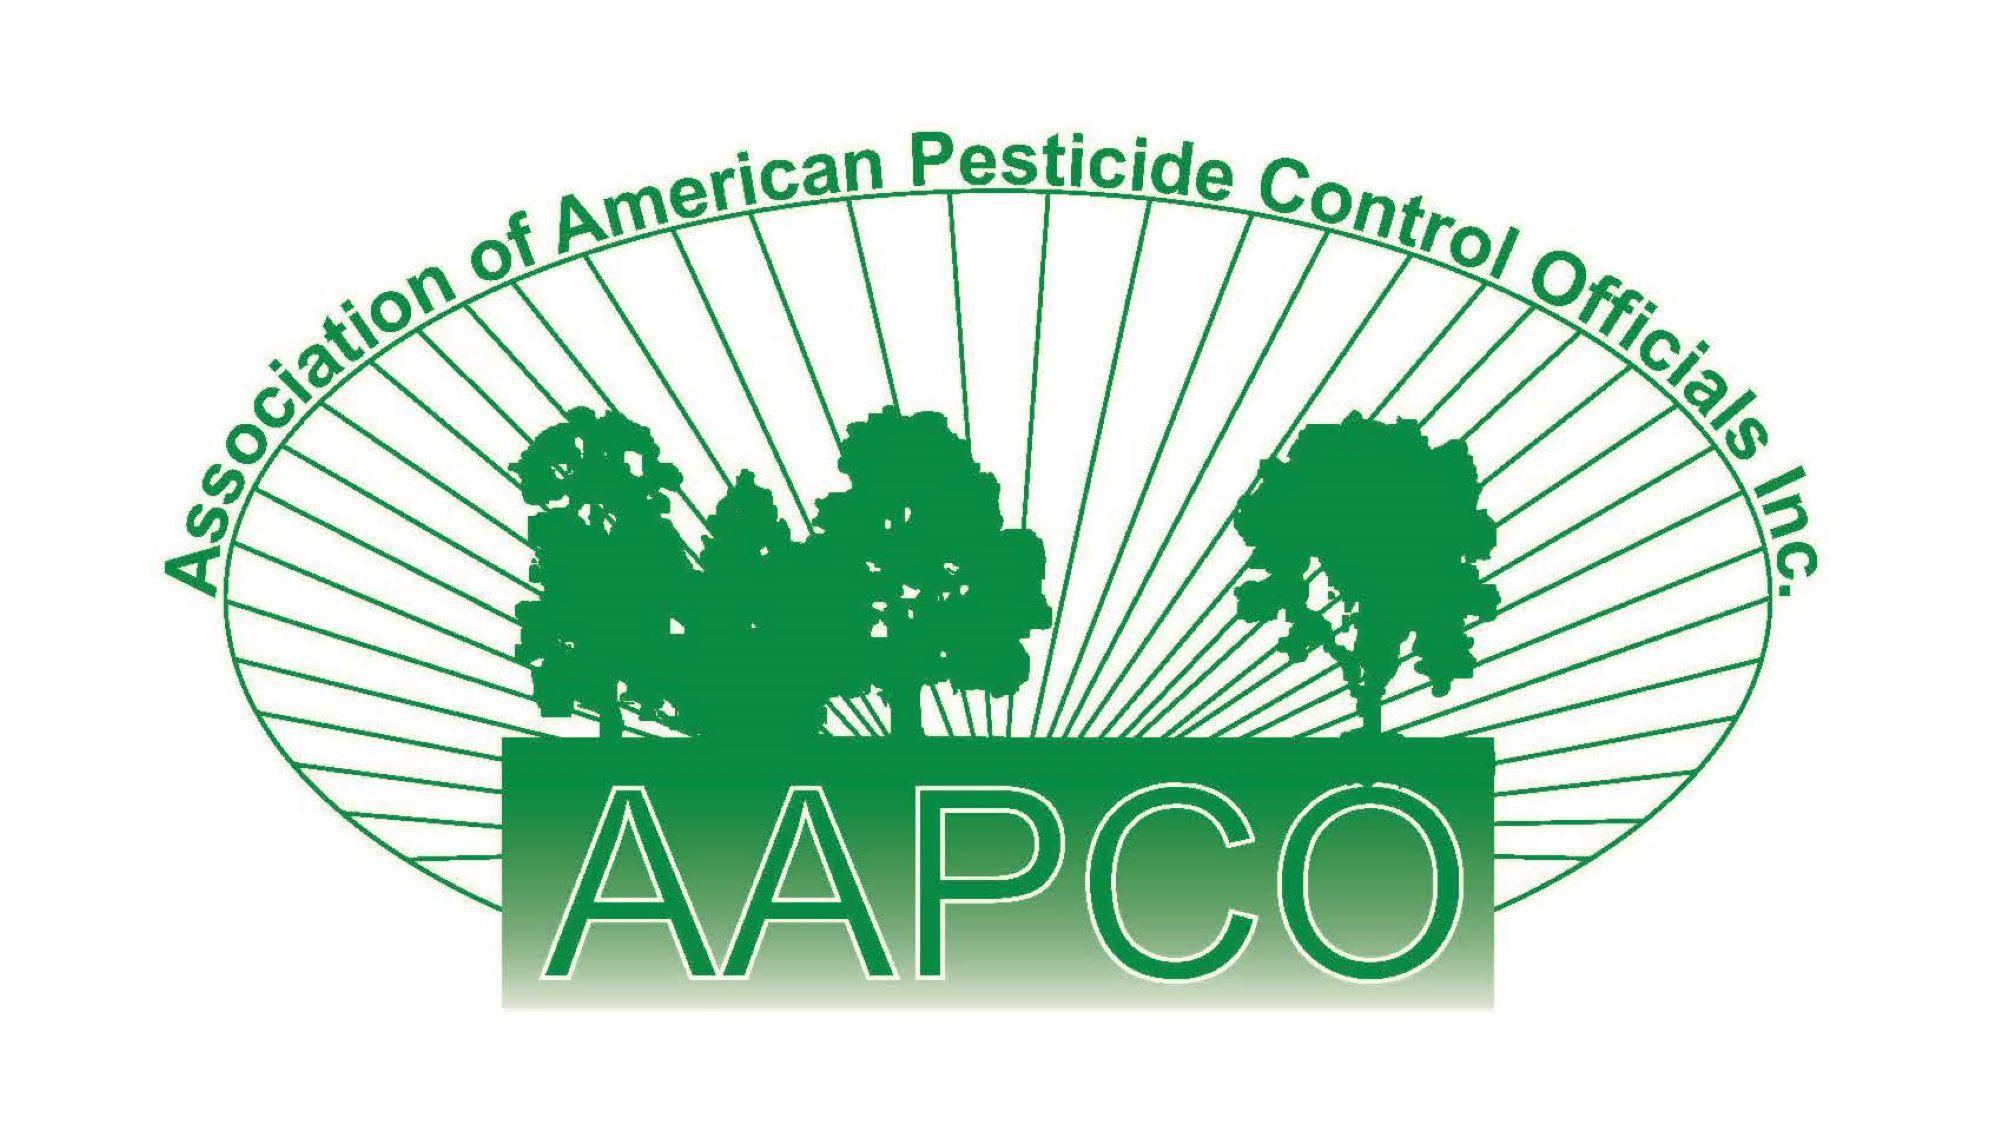 AAPCO, American Association of Pest Control Officials